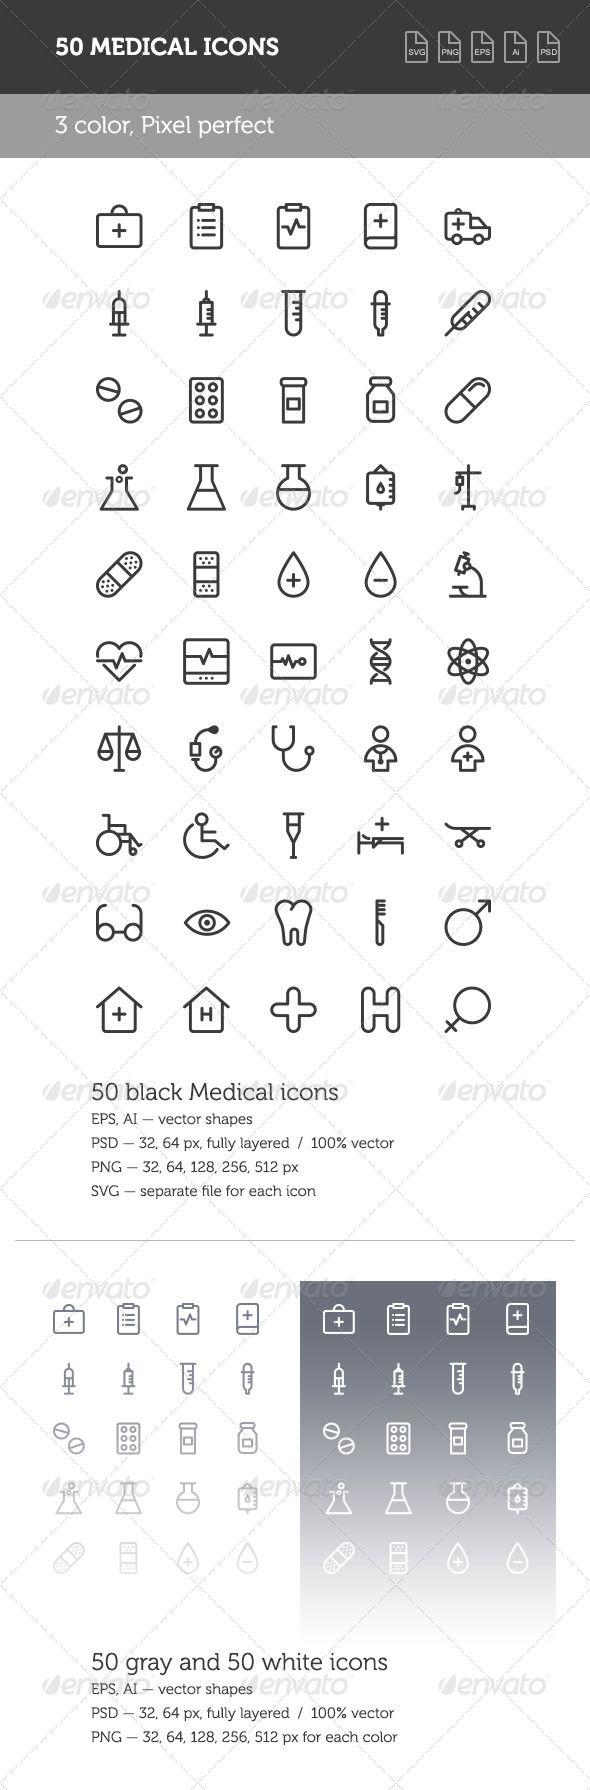 Medical Icon Set ambulance, band aid, blood, care, cross, doctor, drug, eye, health, heart, hospital, icons, laboratory, medical, medicine, meds, nurse, pharmacy, pill, scales, thermometer, Medical Icon Set